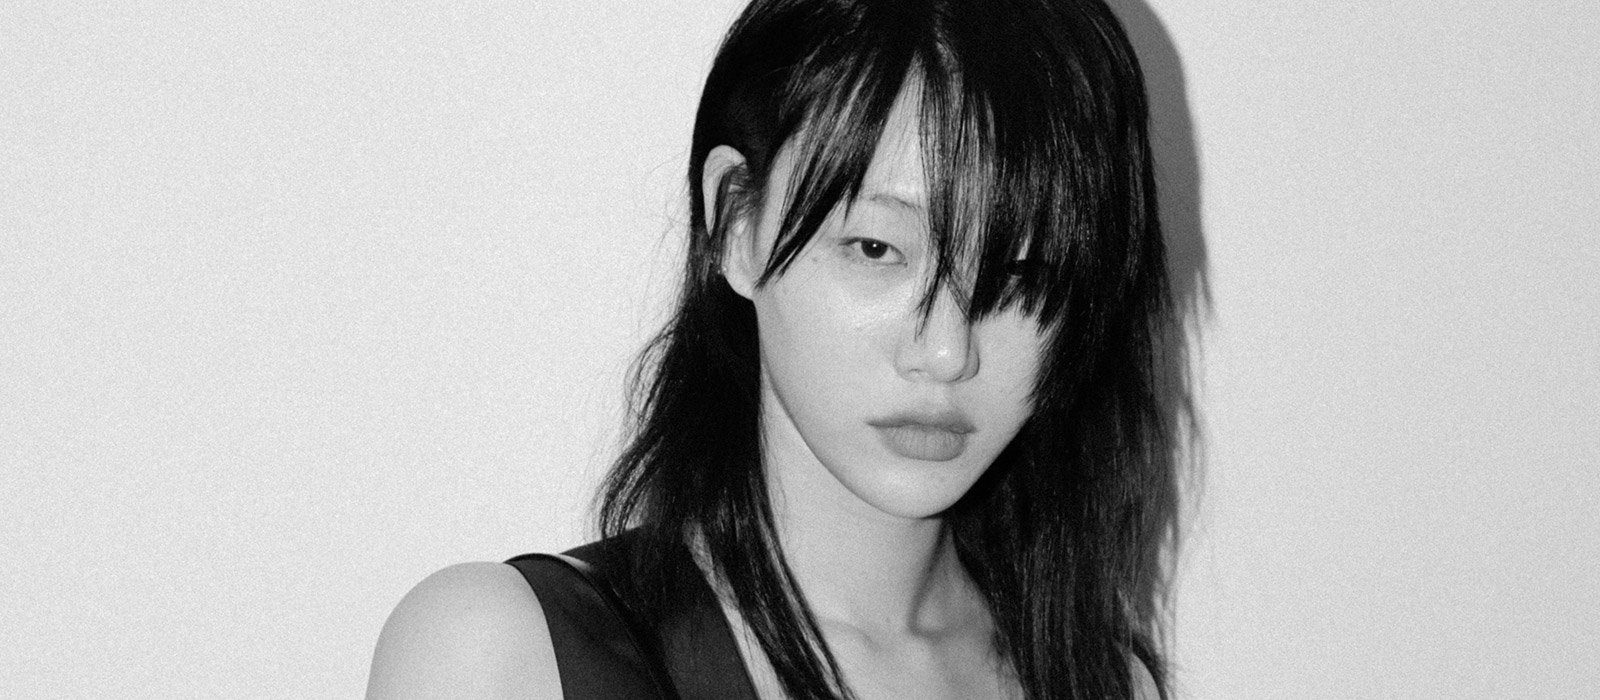 sora-choi-interview-main